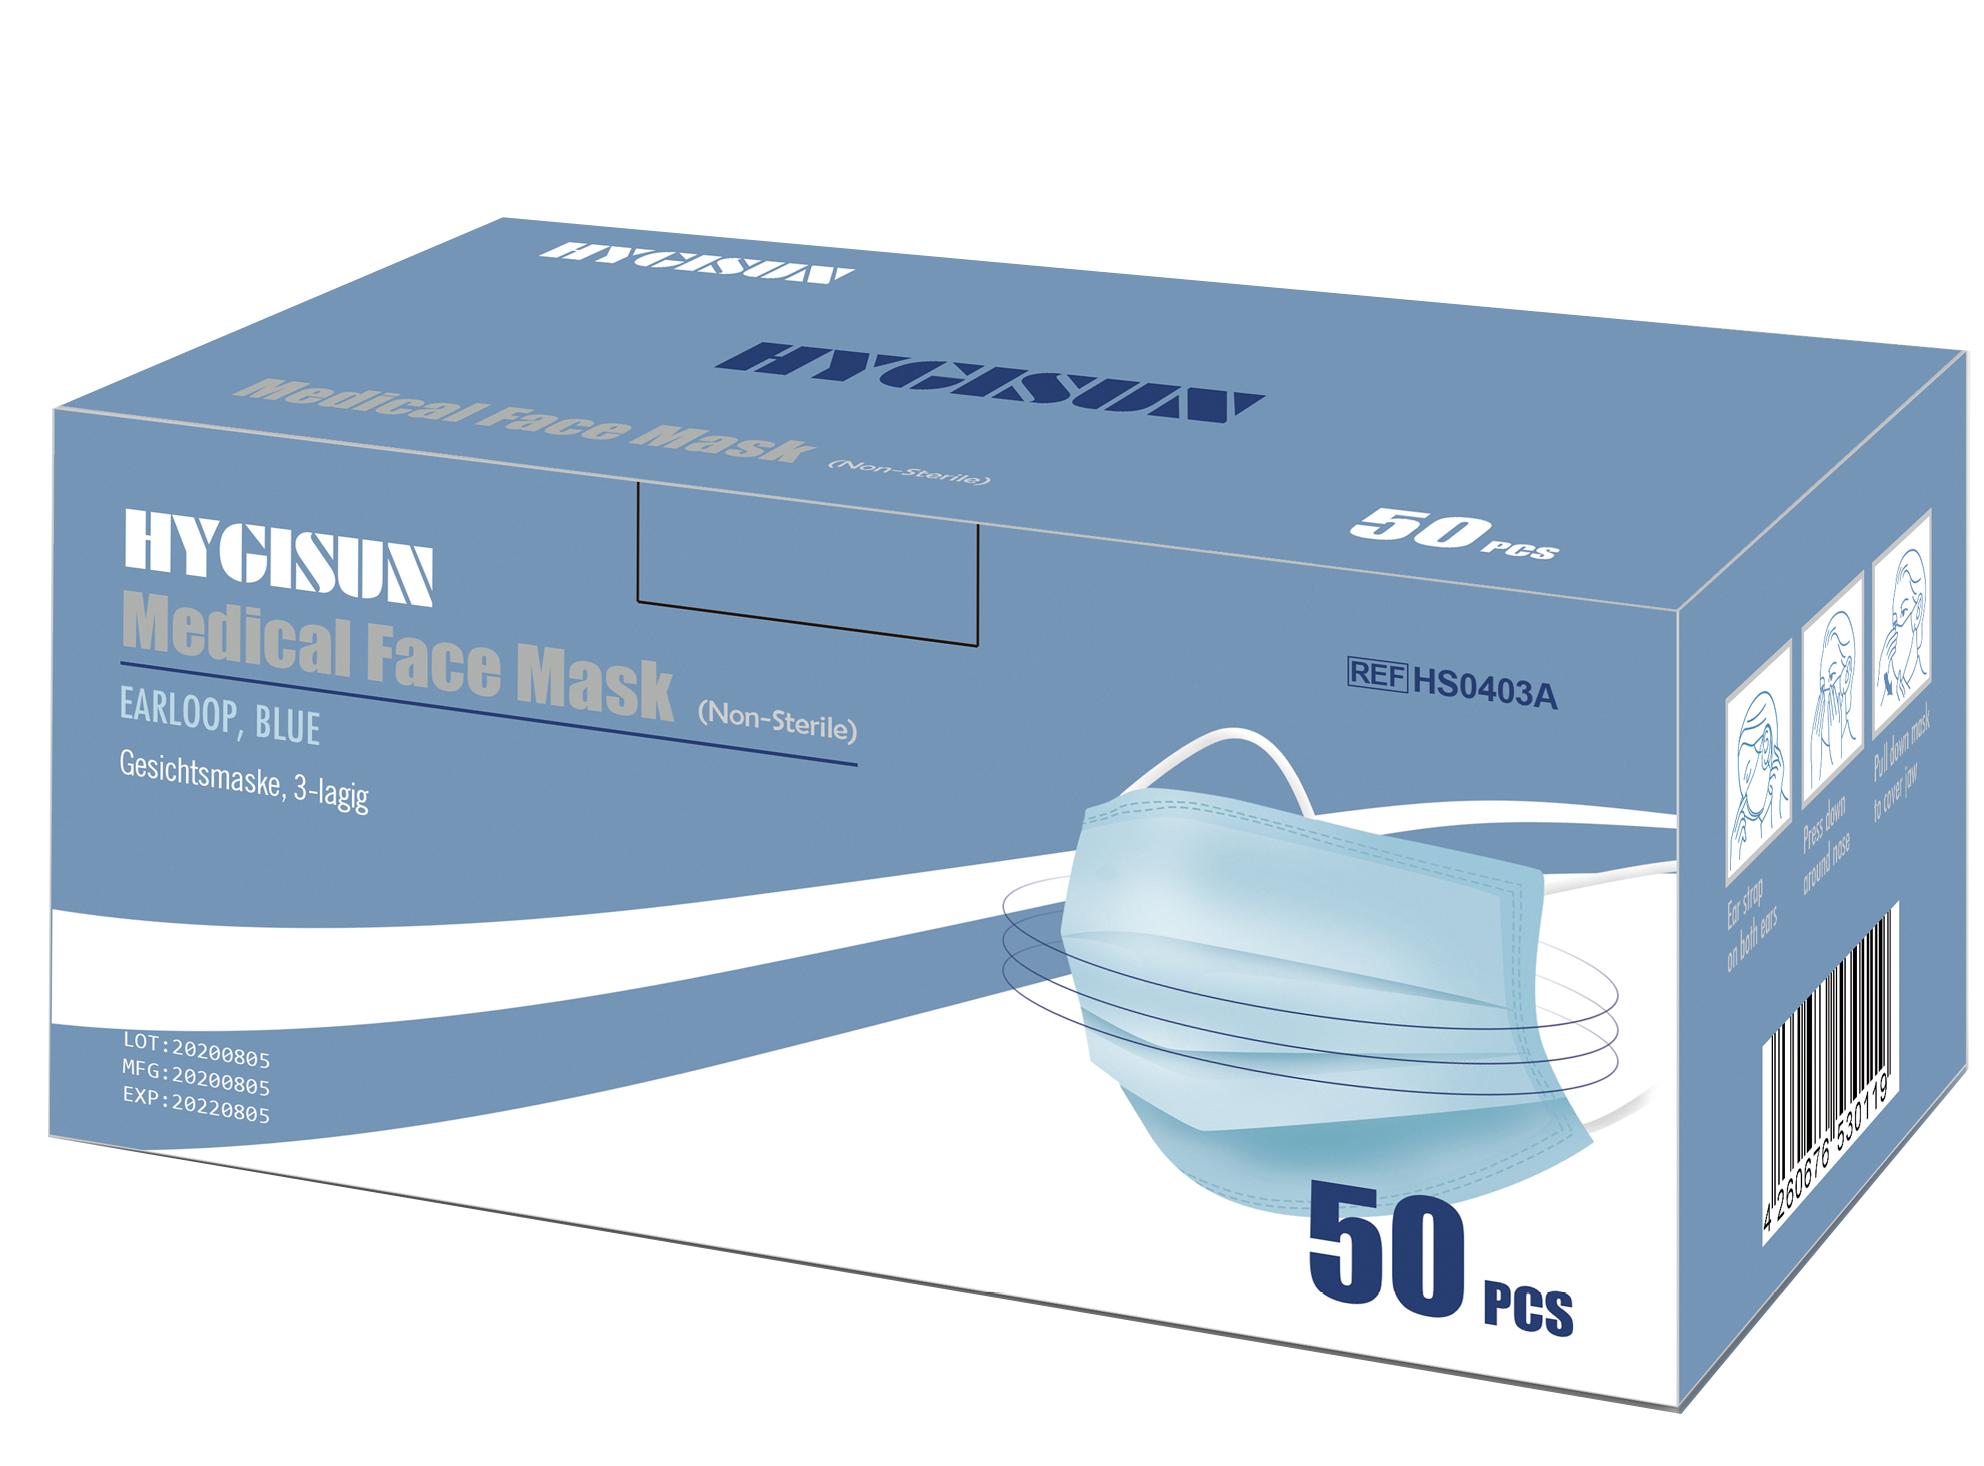 Typ II R Medizinische Mundschutzmasken 3- lagig (50Stk.) (EN 2016/425 zertifiziert)